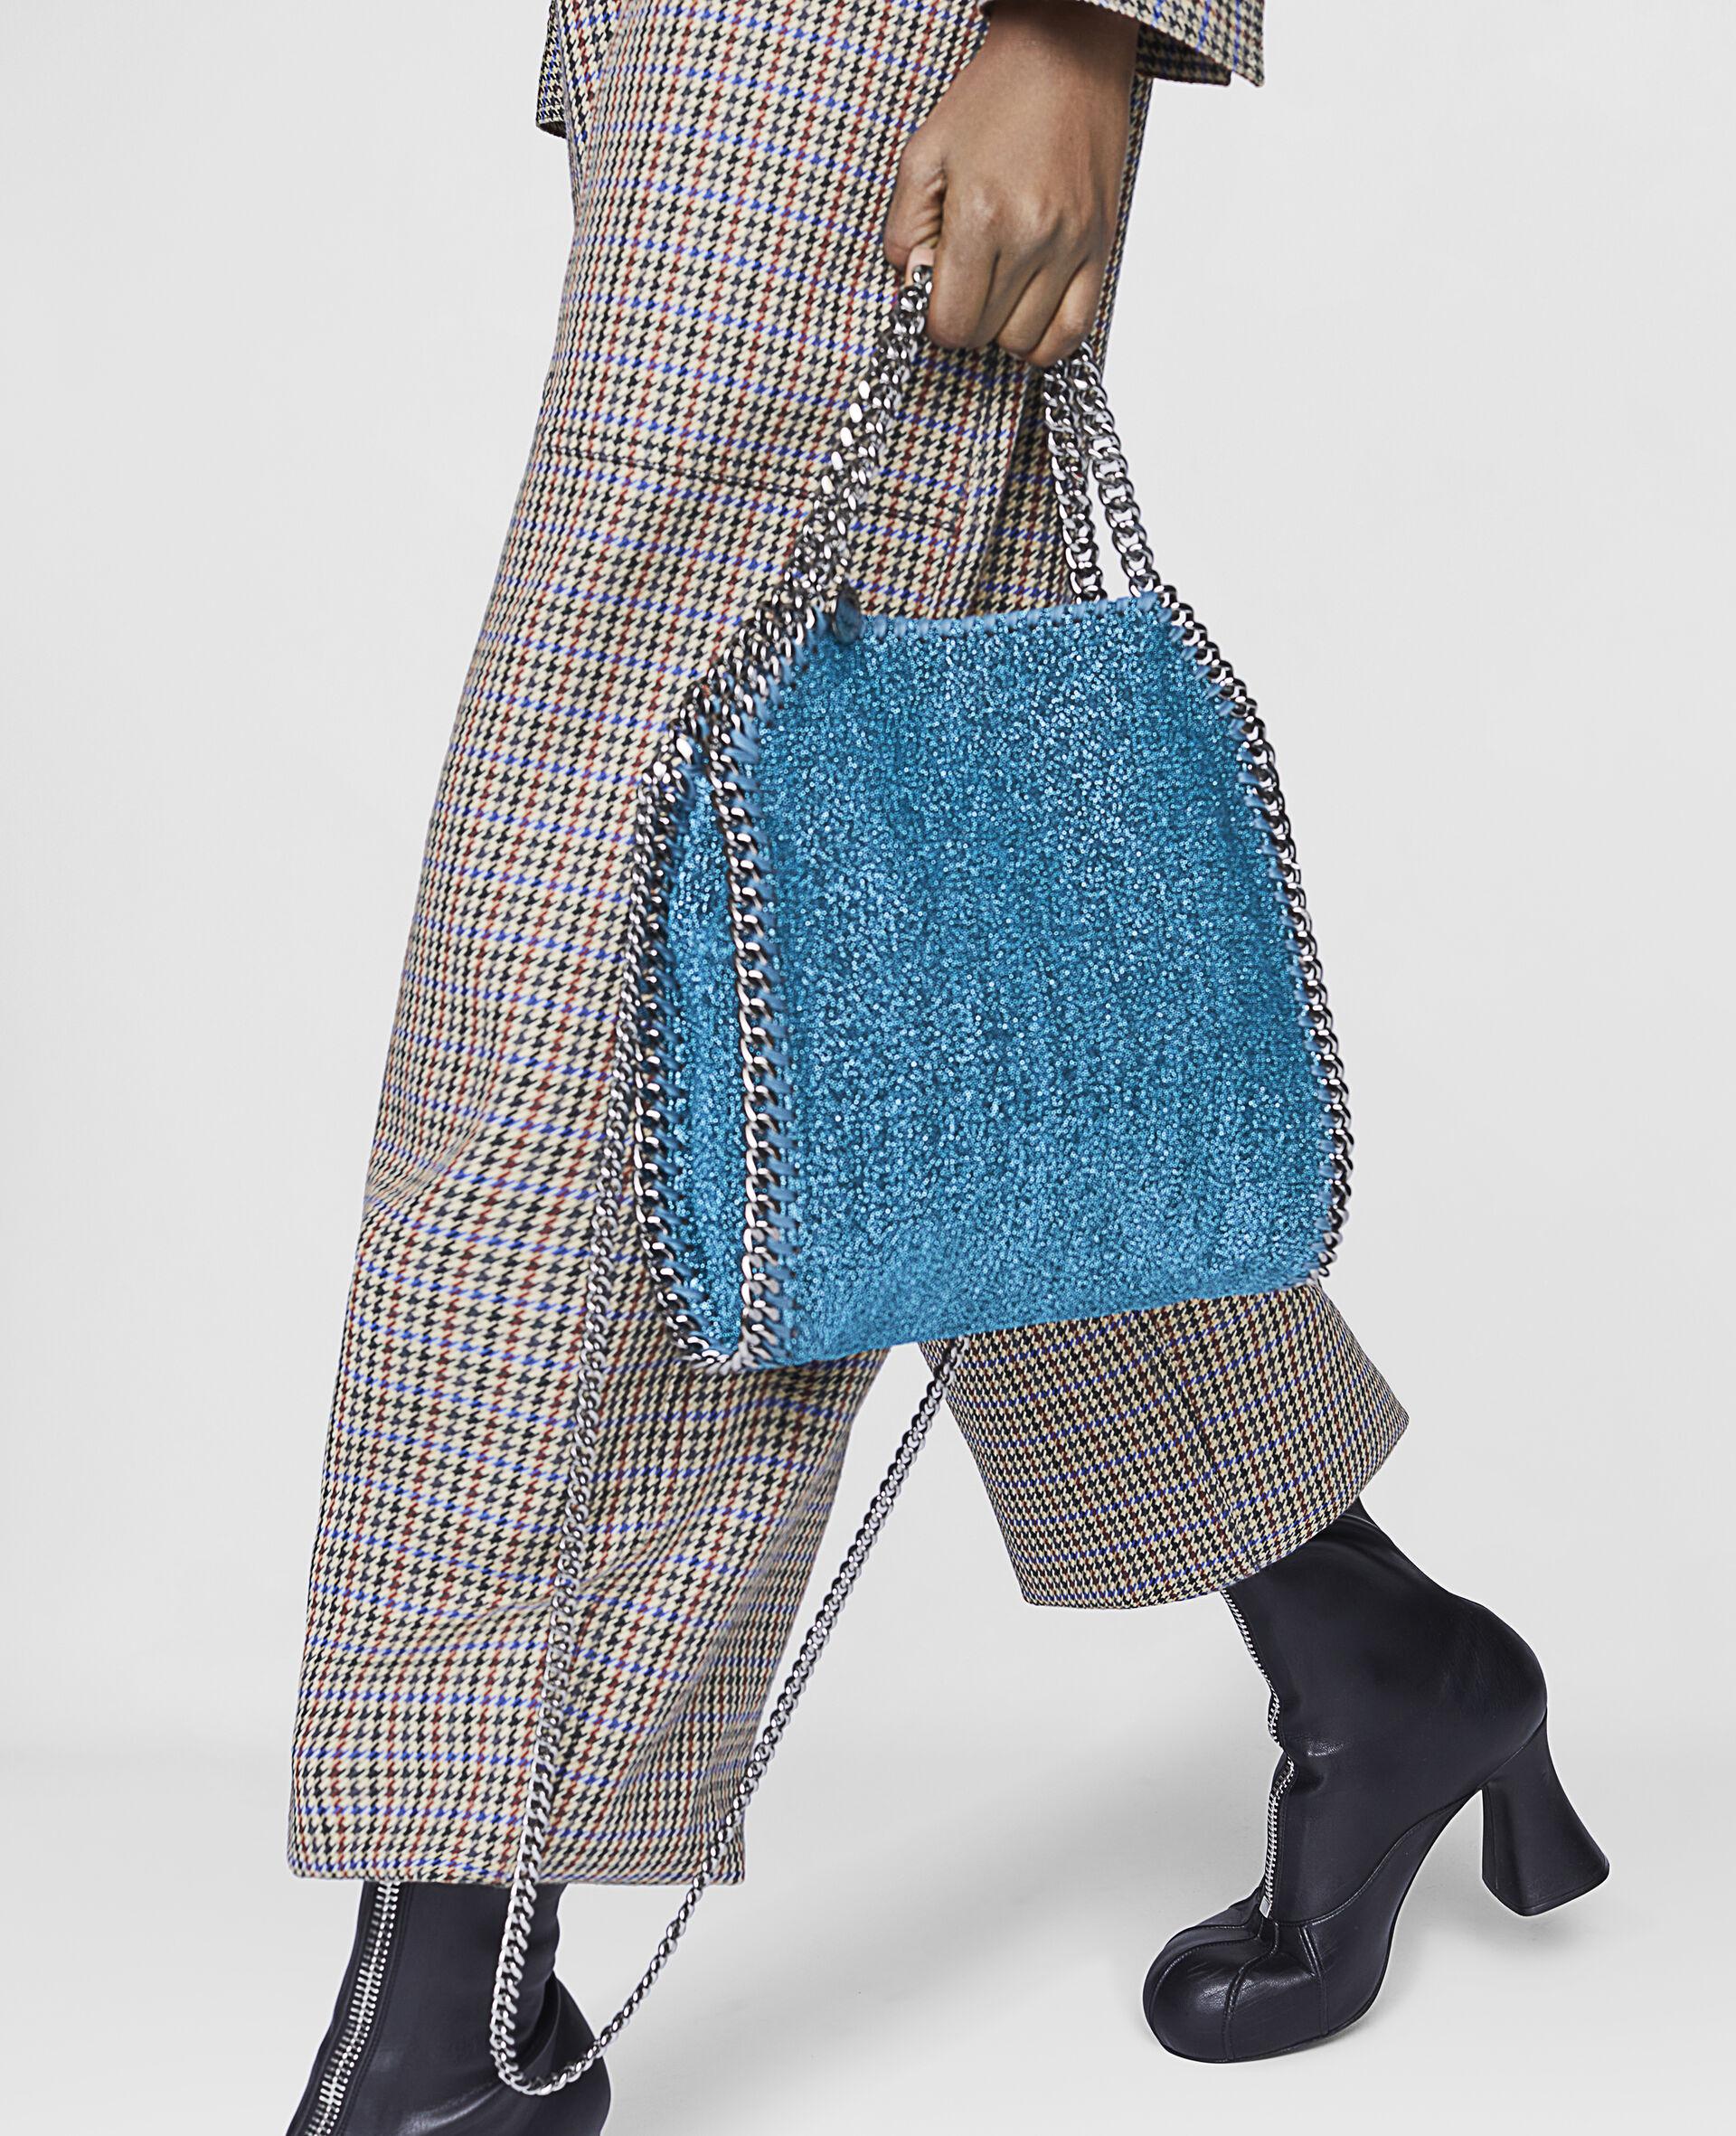 Falabella Mini Tote Bag aus glitzerndem Lurex-Blau-large image number 4